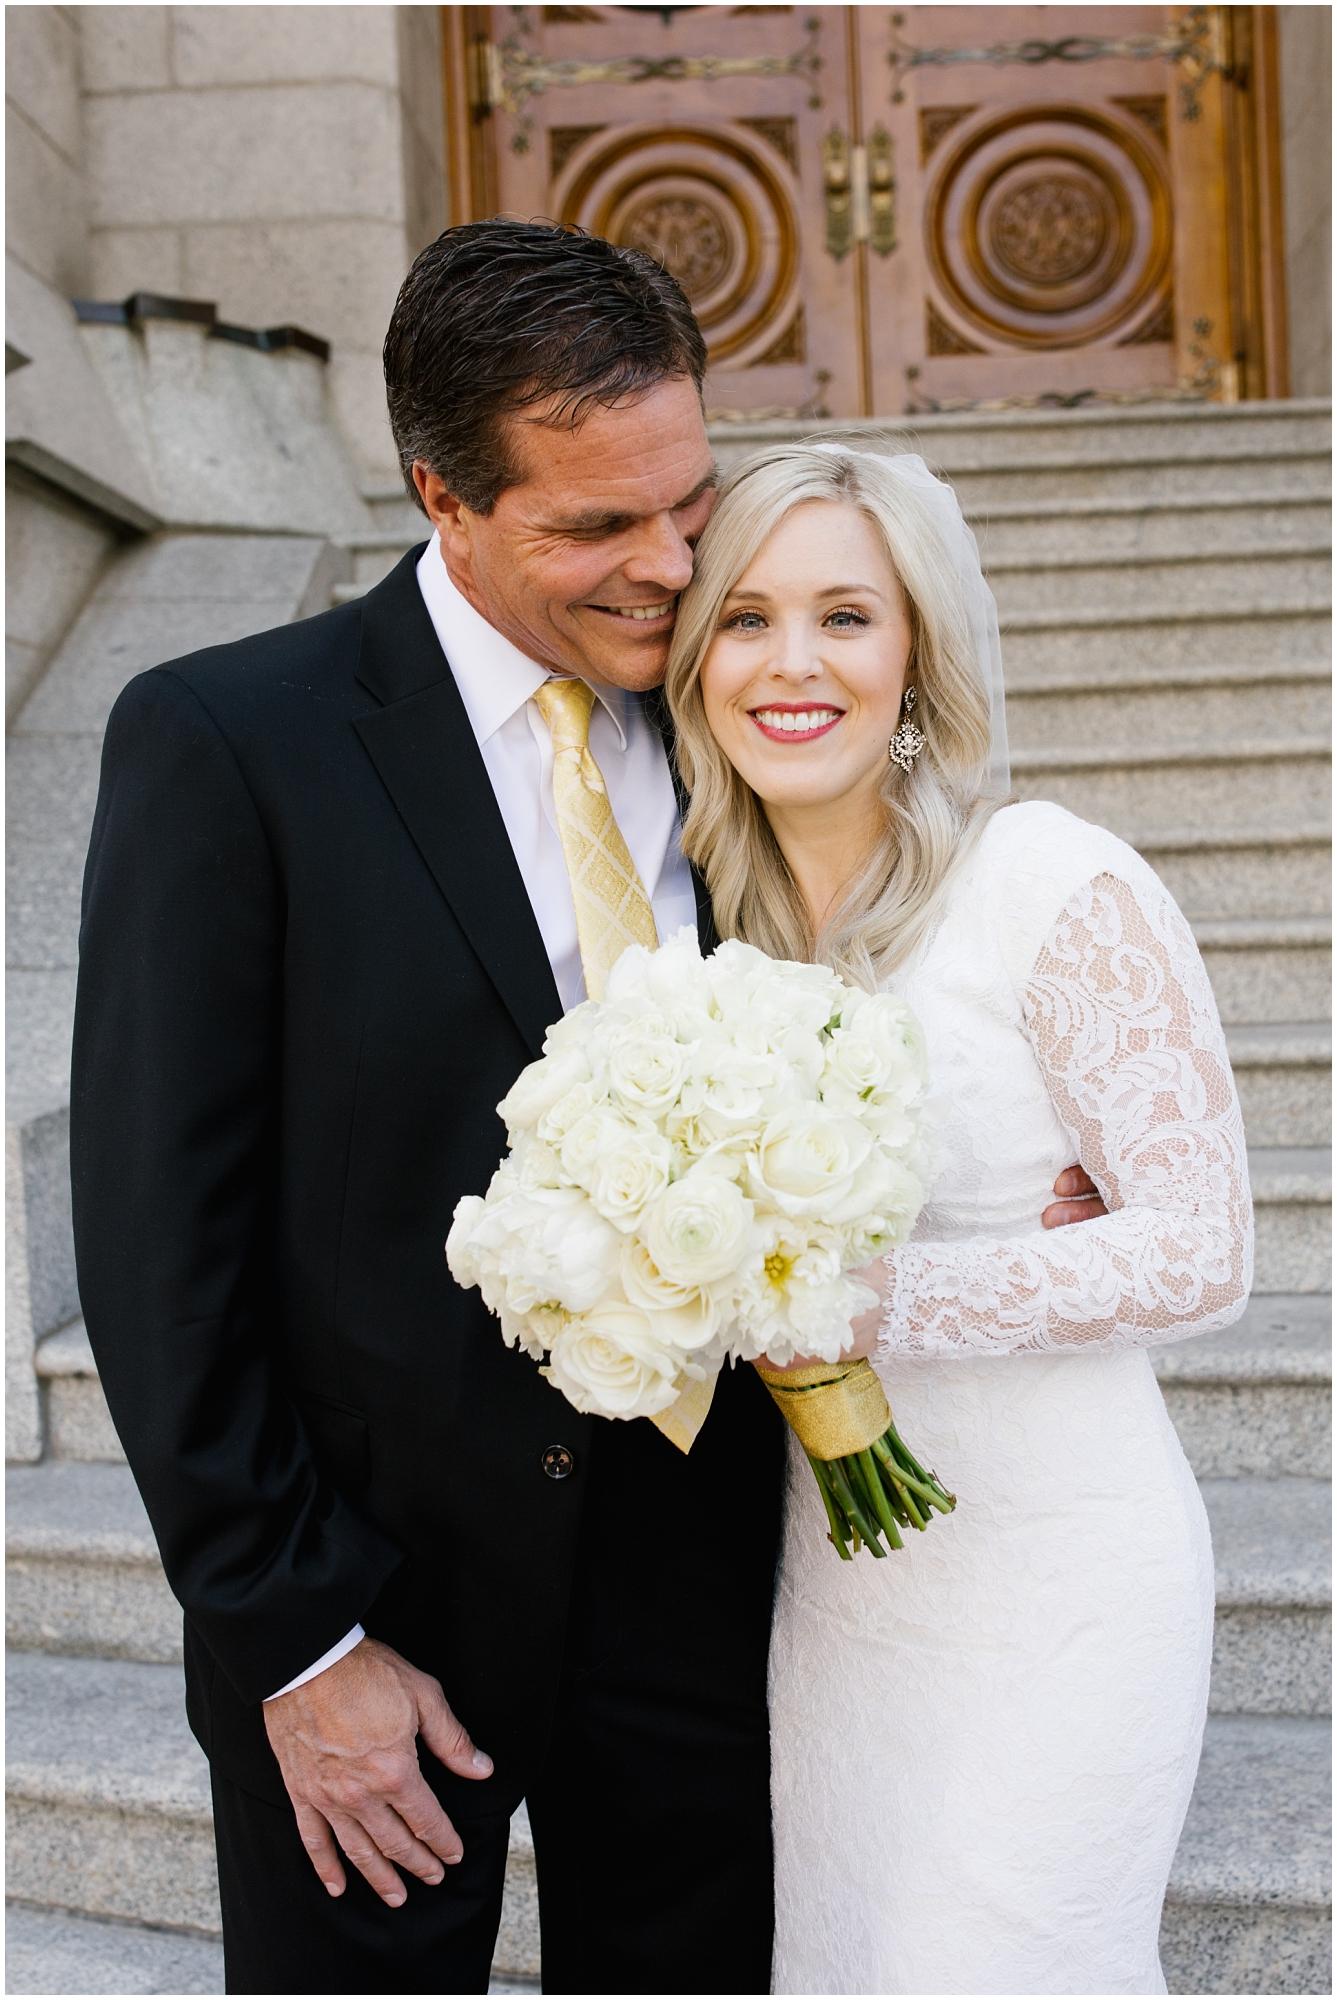 CherylandTyler-94_Lizzie-B-Imagery-Utah-Wedding-Photographer-Park-City-Salt-Lake-City-Temple-Wells-Fargo-Building.jpg